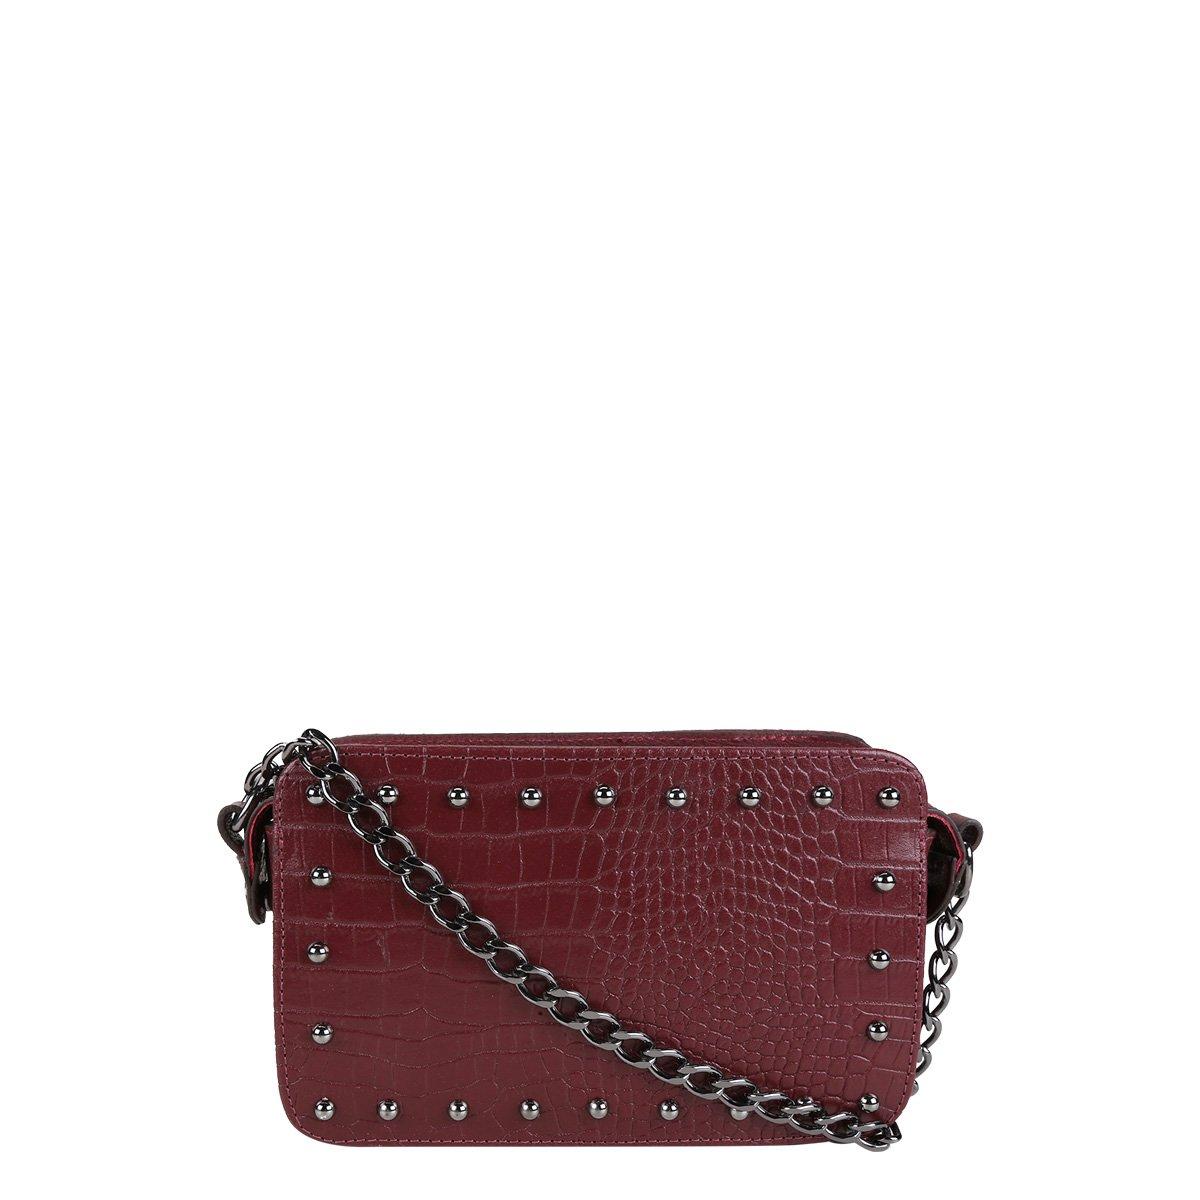 d908ec808 Bolsa Couro Shoestock Mini Bag Tachas Feminina | Shoestock